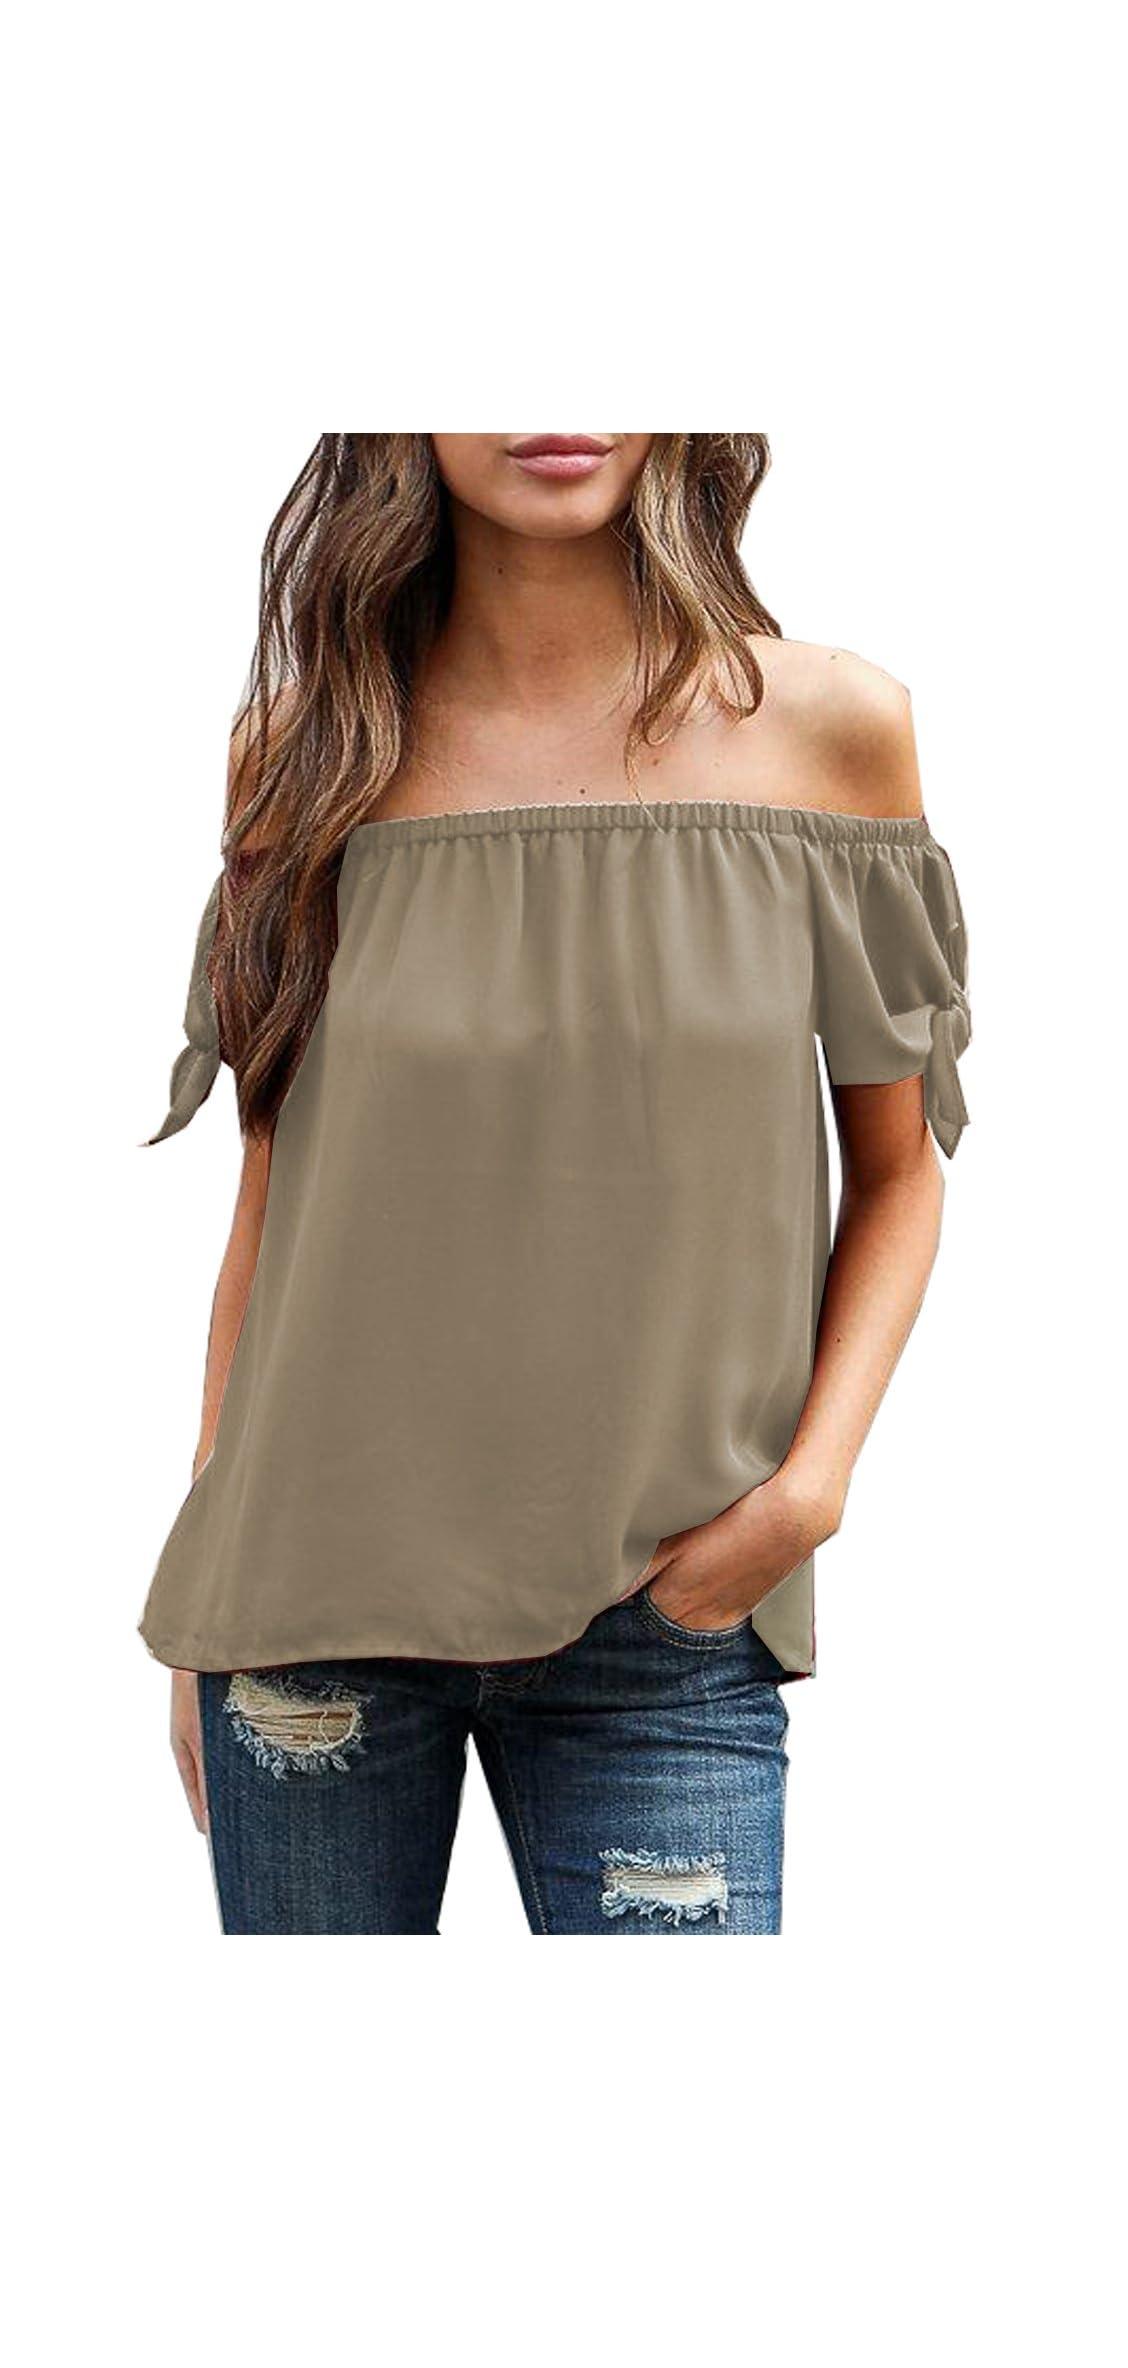 Summer Women's Short Sleeve Off Shoulder Tops Casual